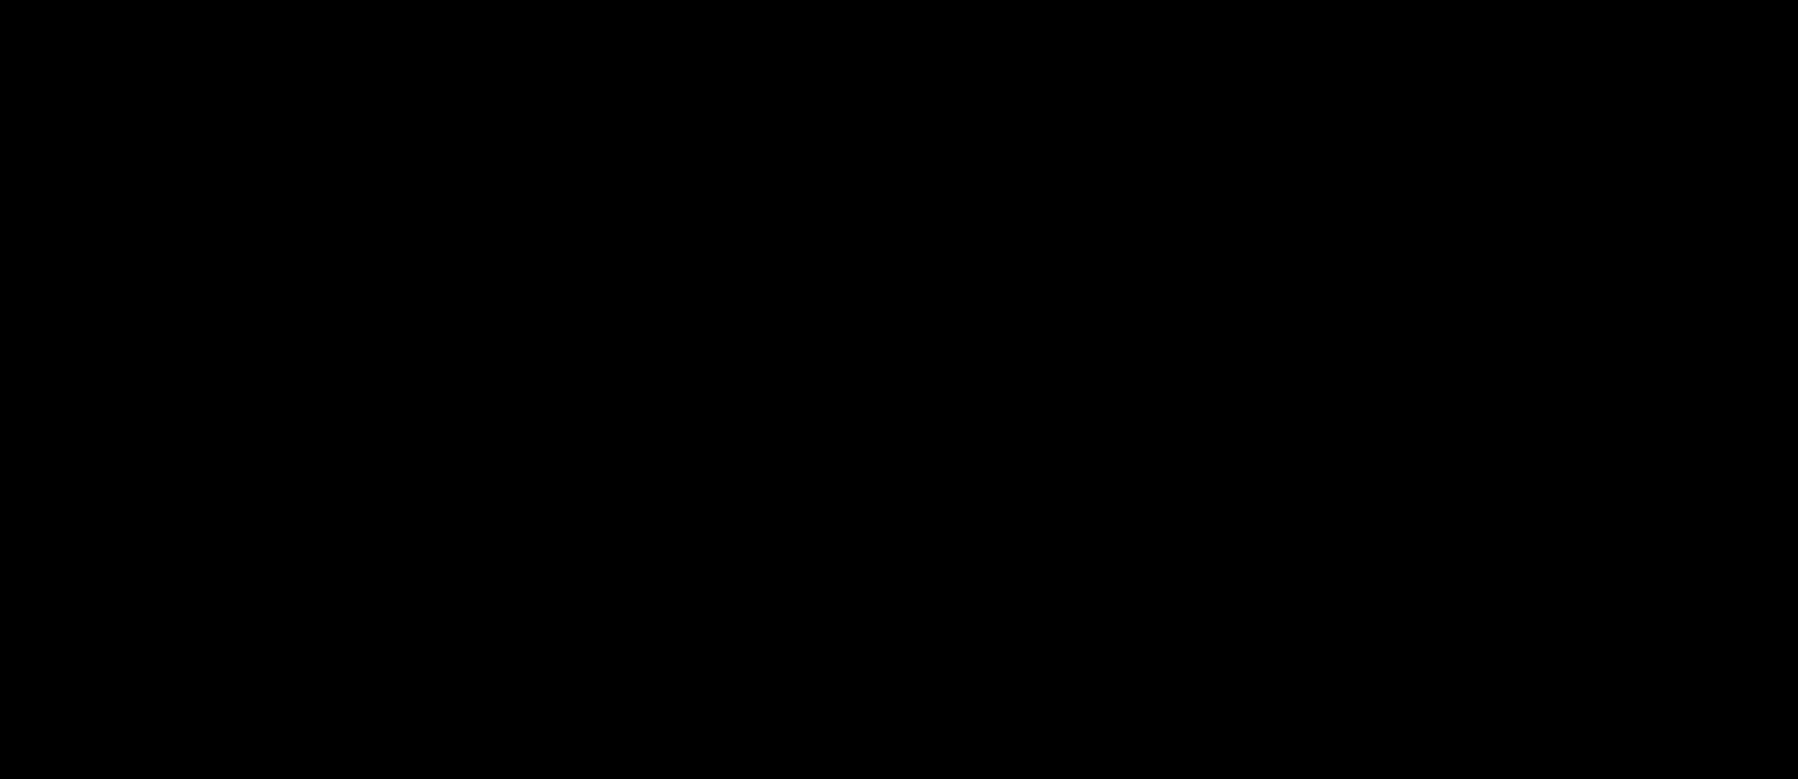 [Tyr8] Substance P